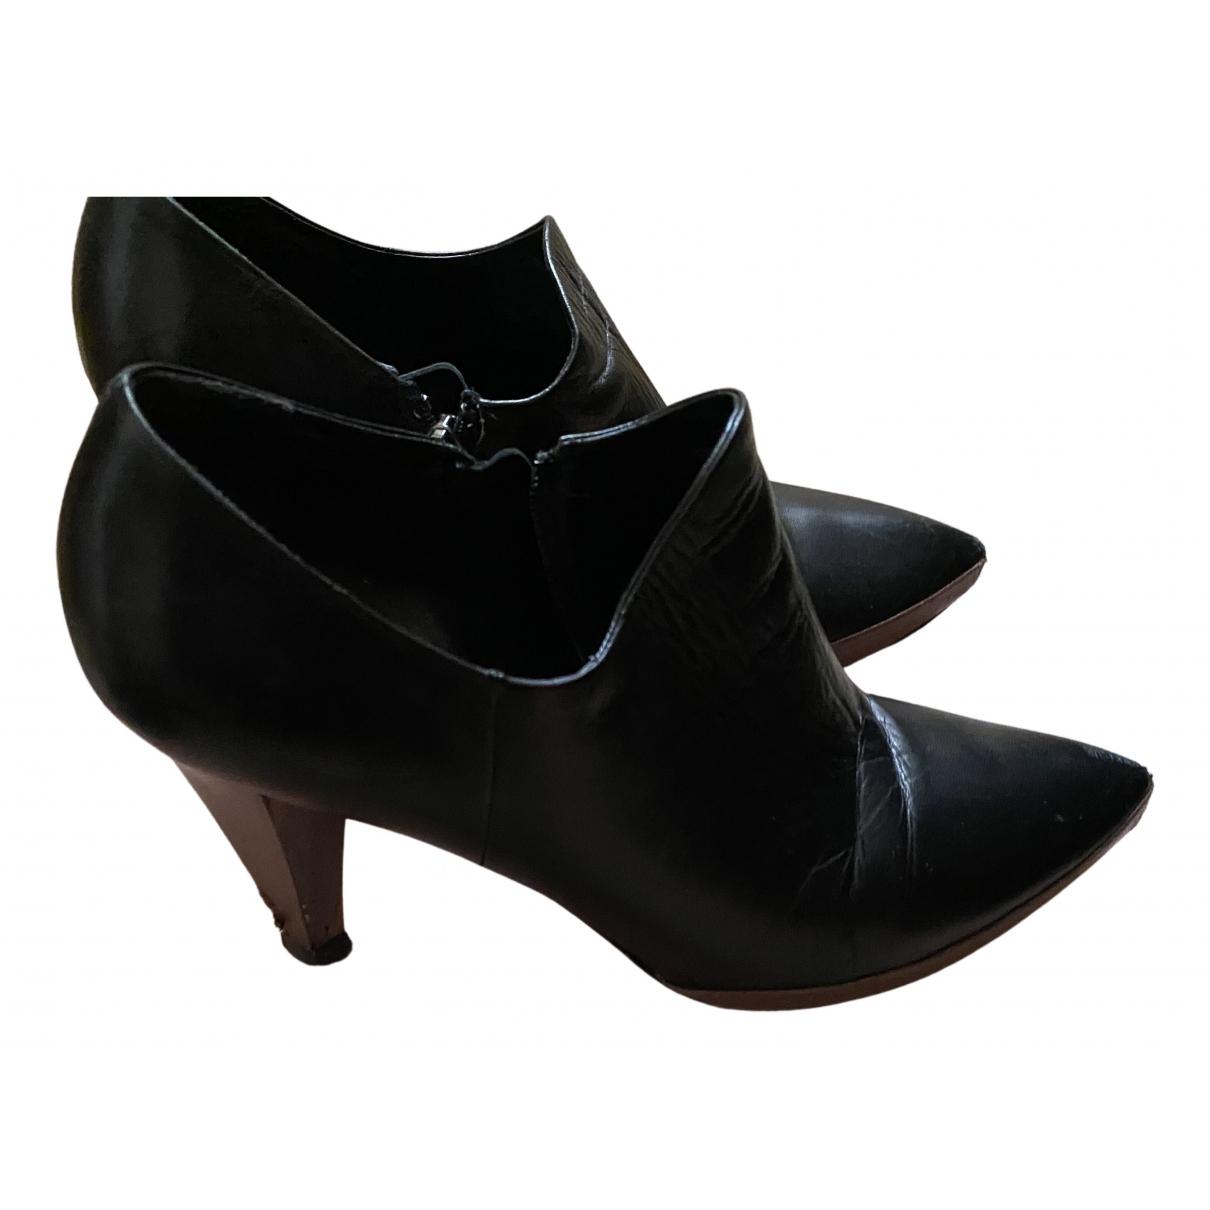 Miu Miu N Black Leather Ankle boots for Women 38 EU